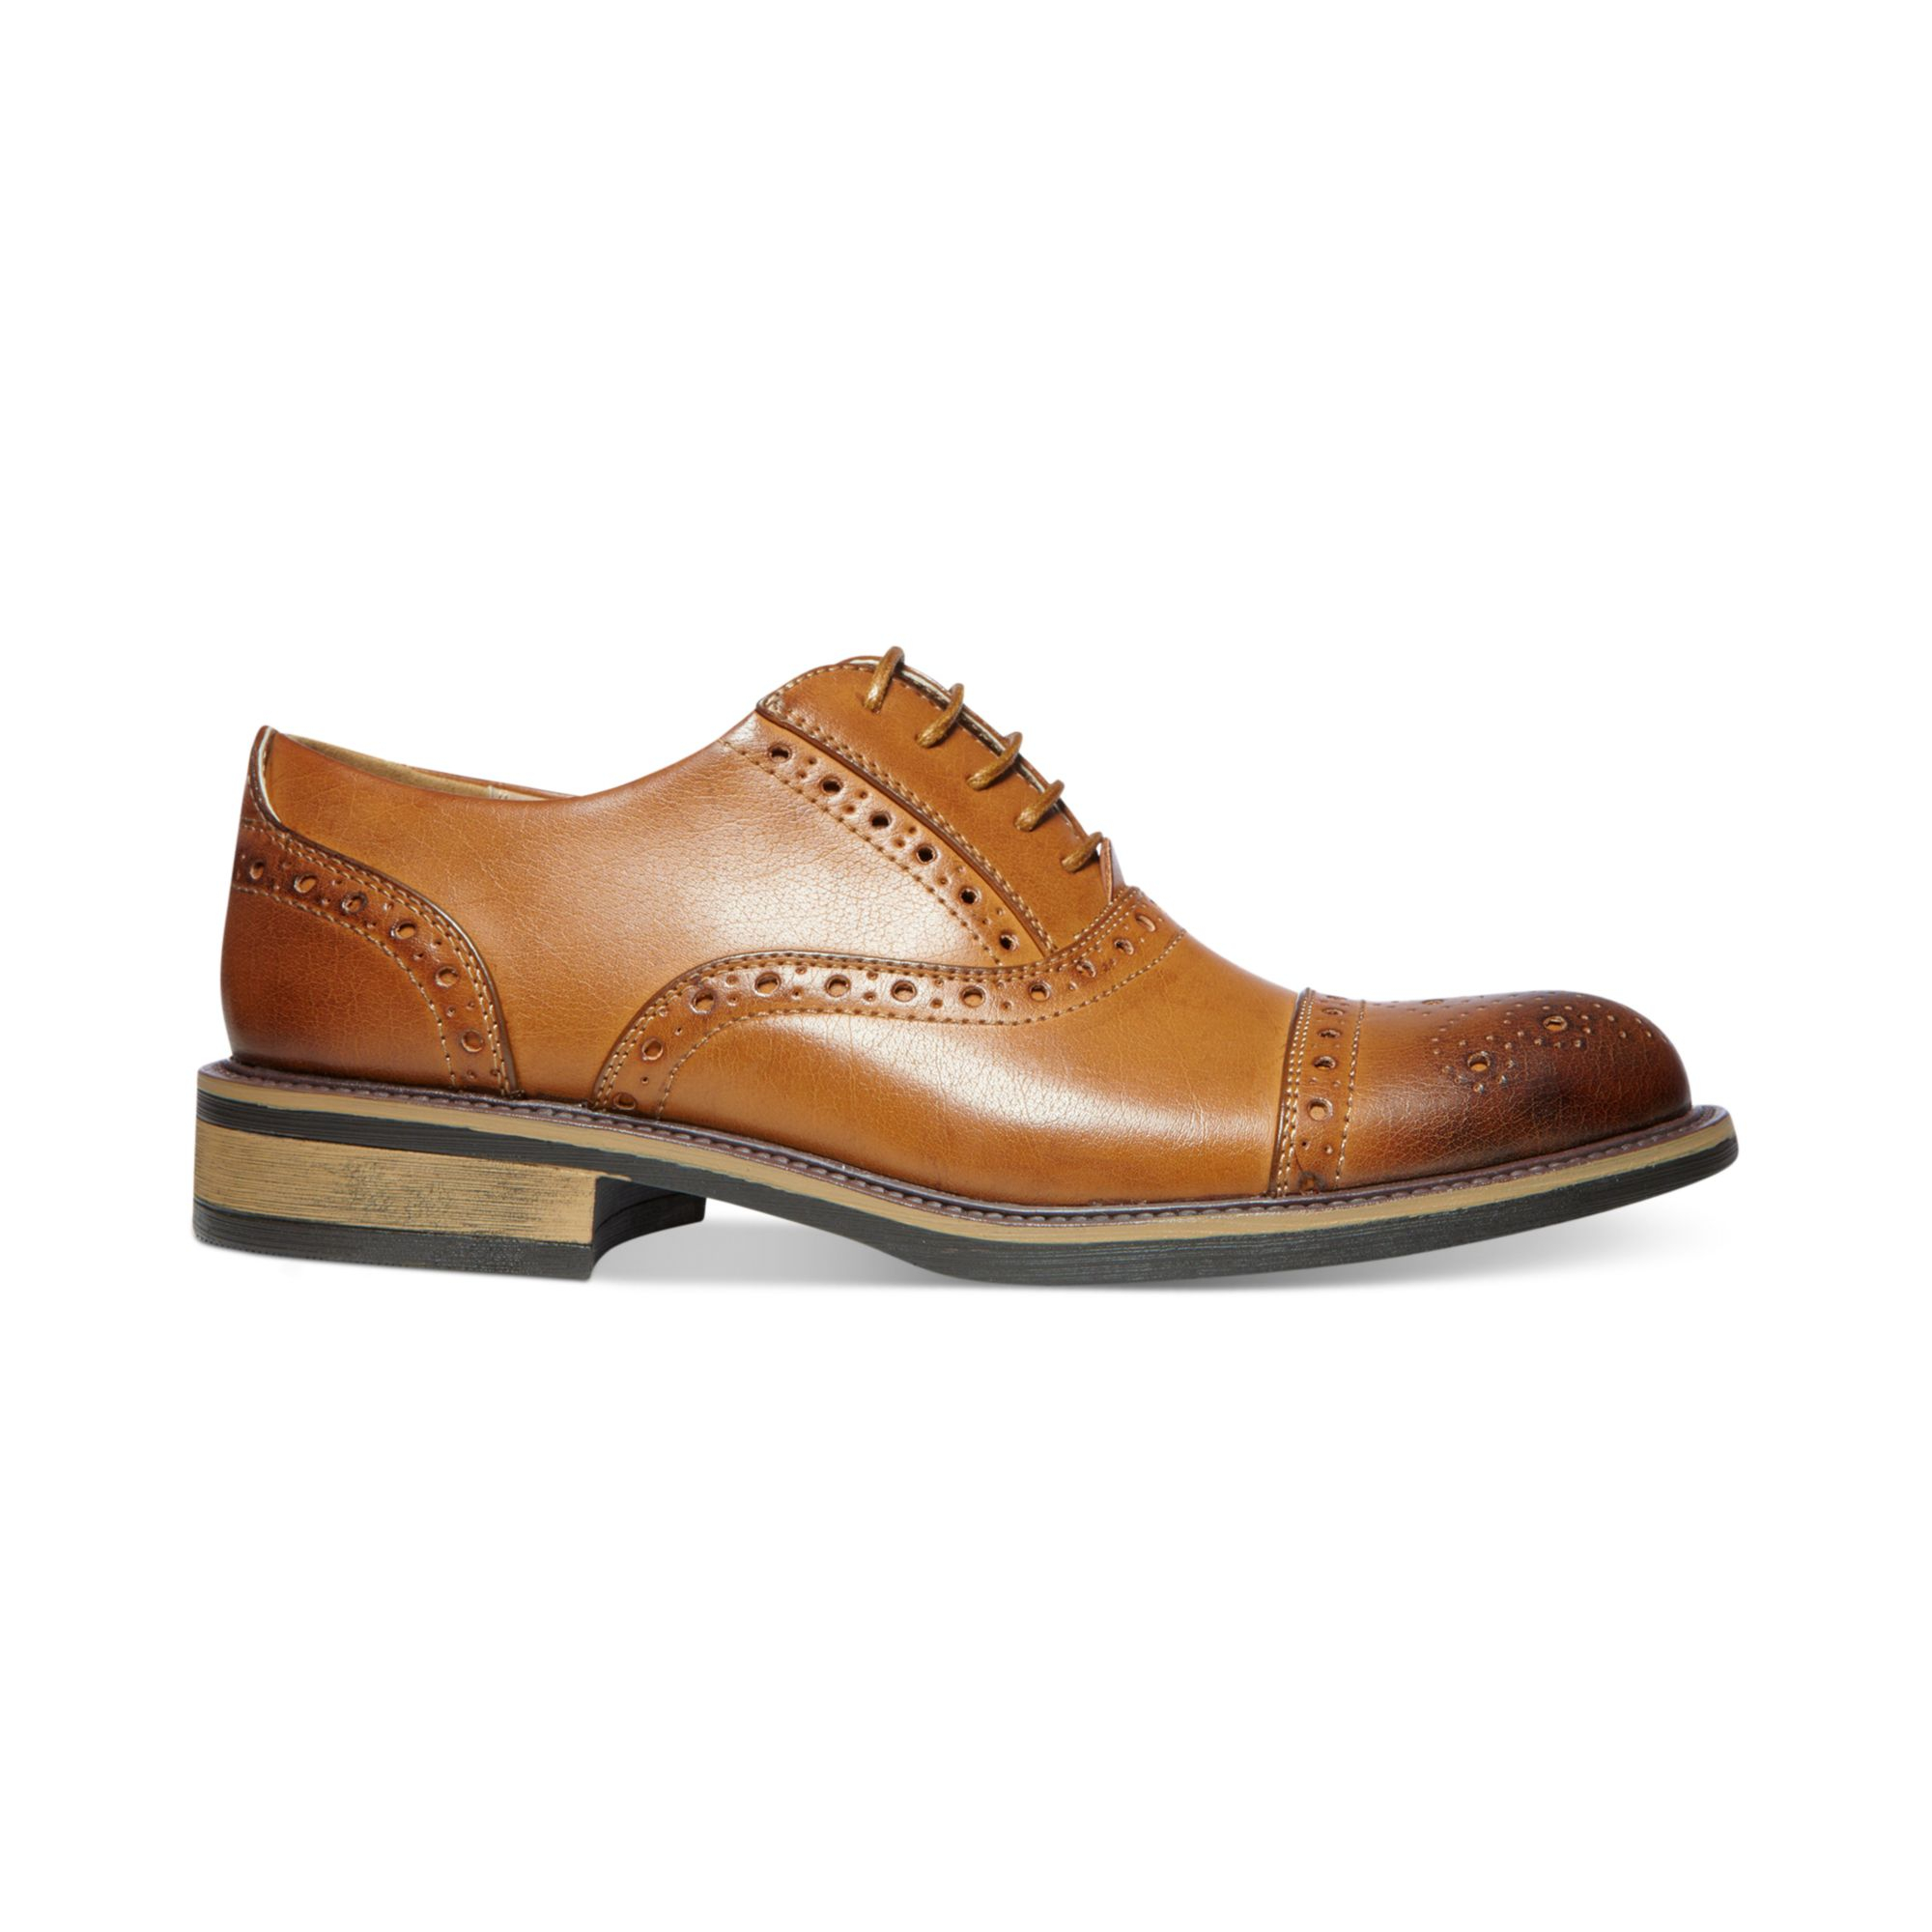 Steve Madden Madden Ziggy Cap Toe Dress Shoes in Brown for Men (Tan)